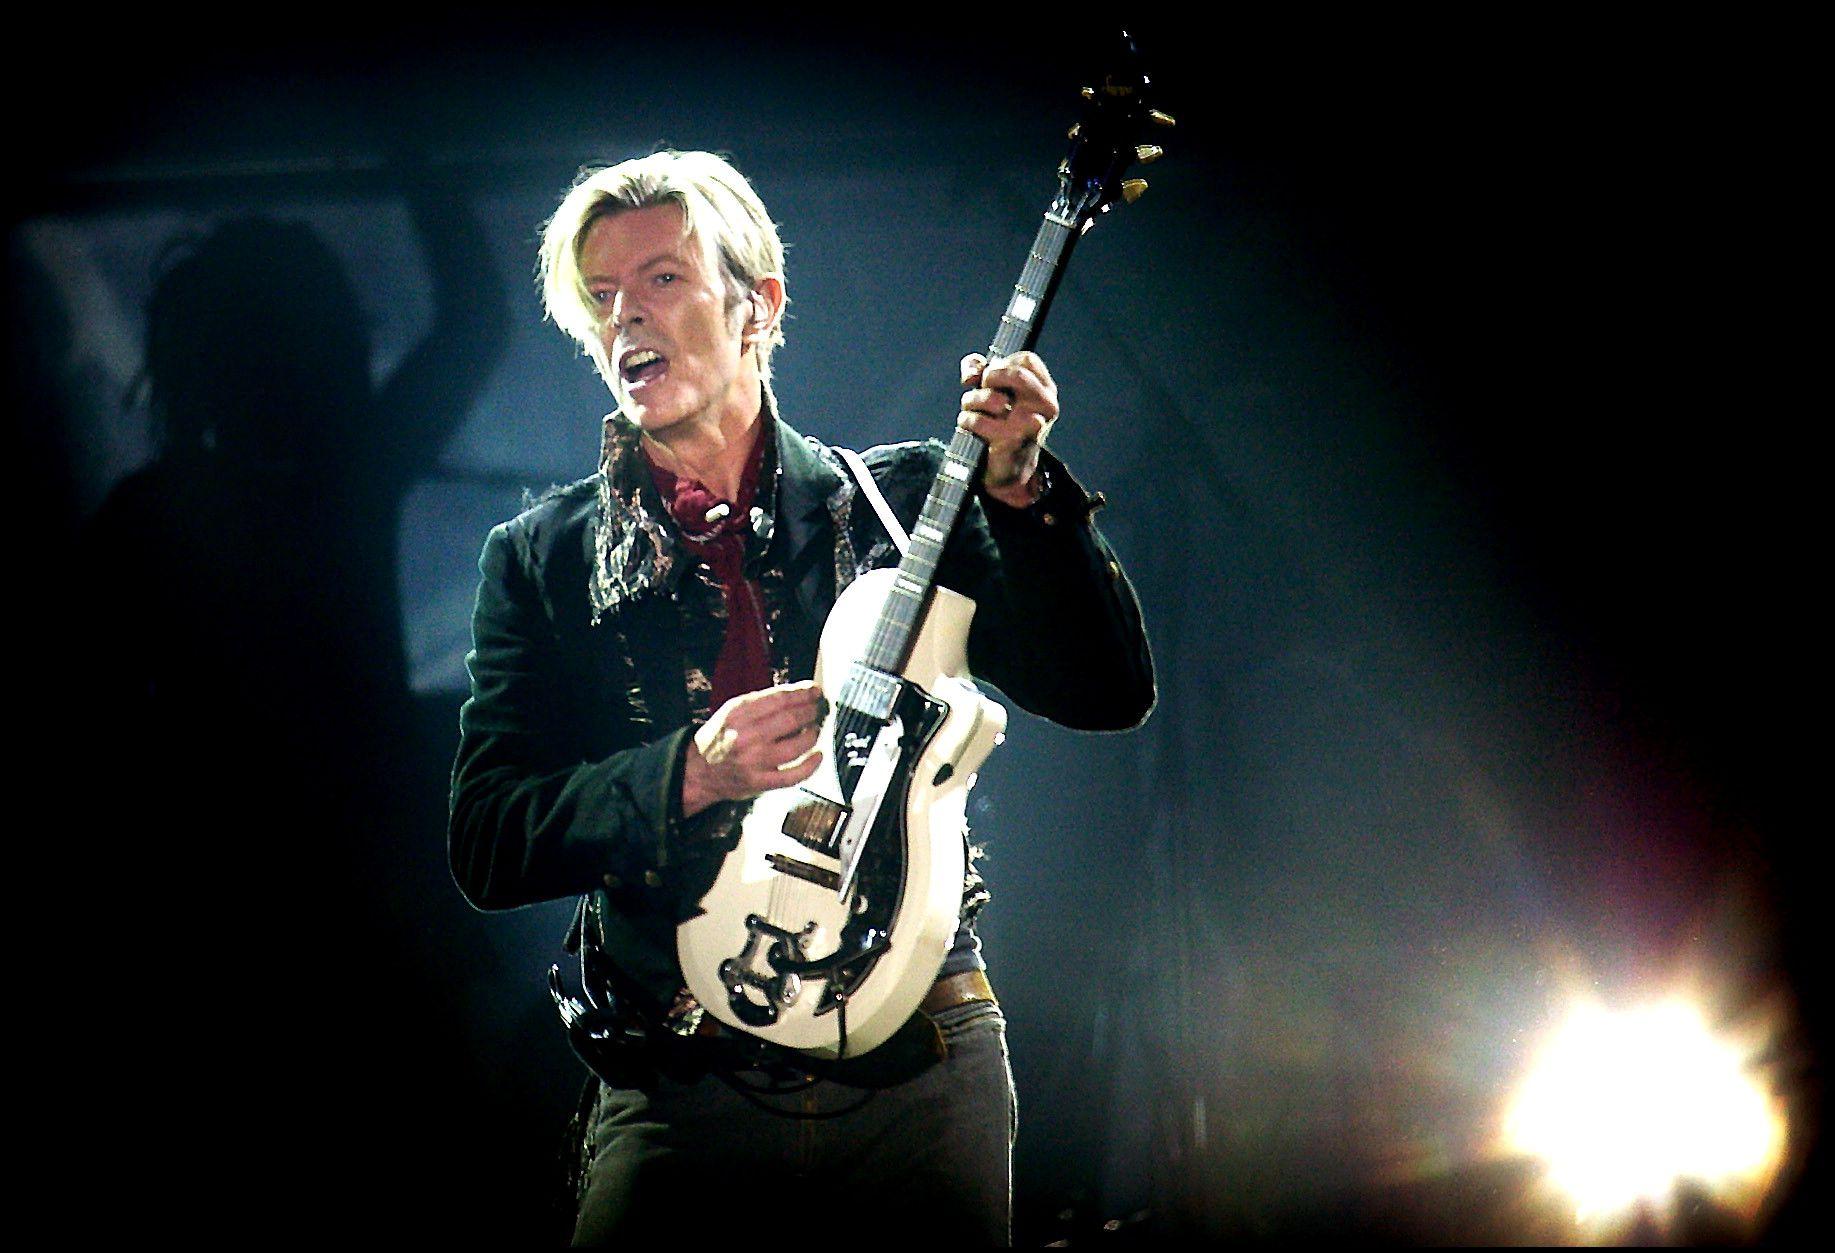 David Bowie in 2003